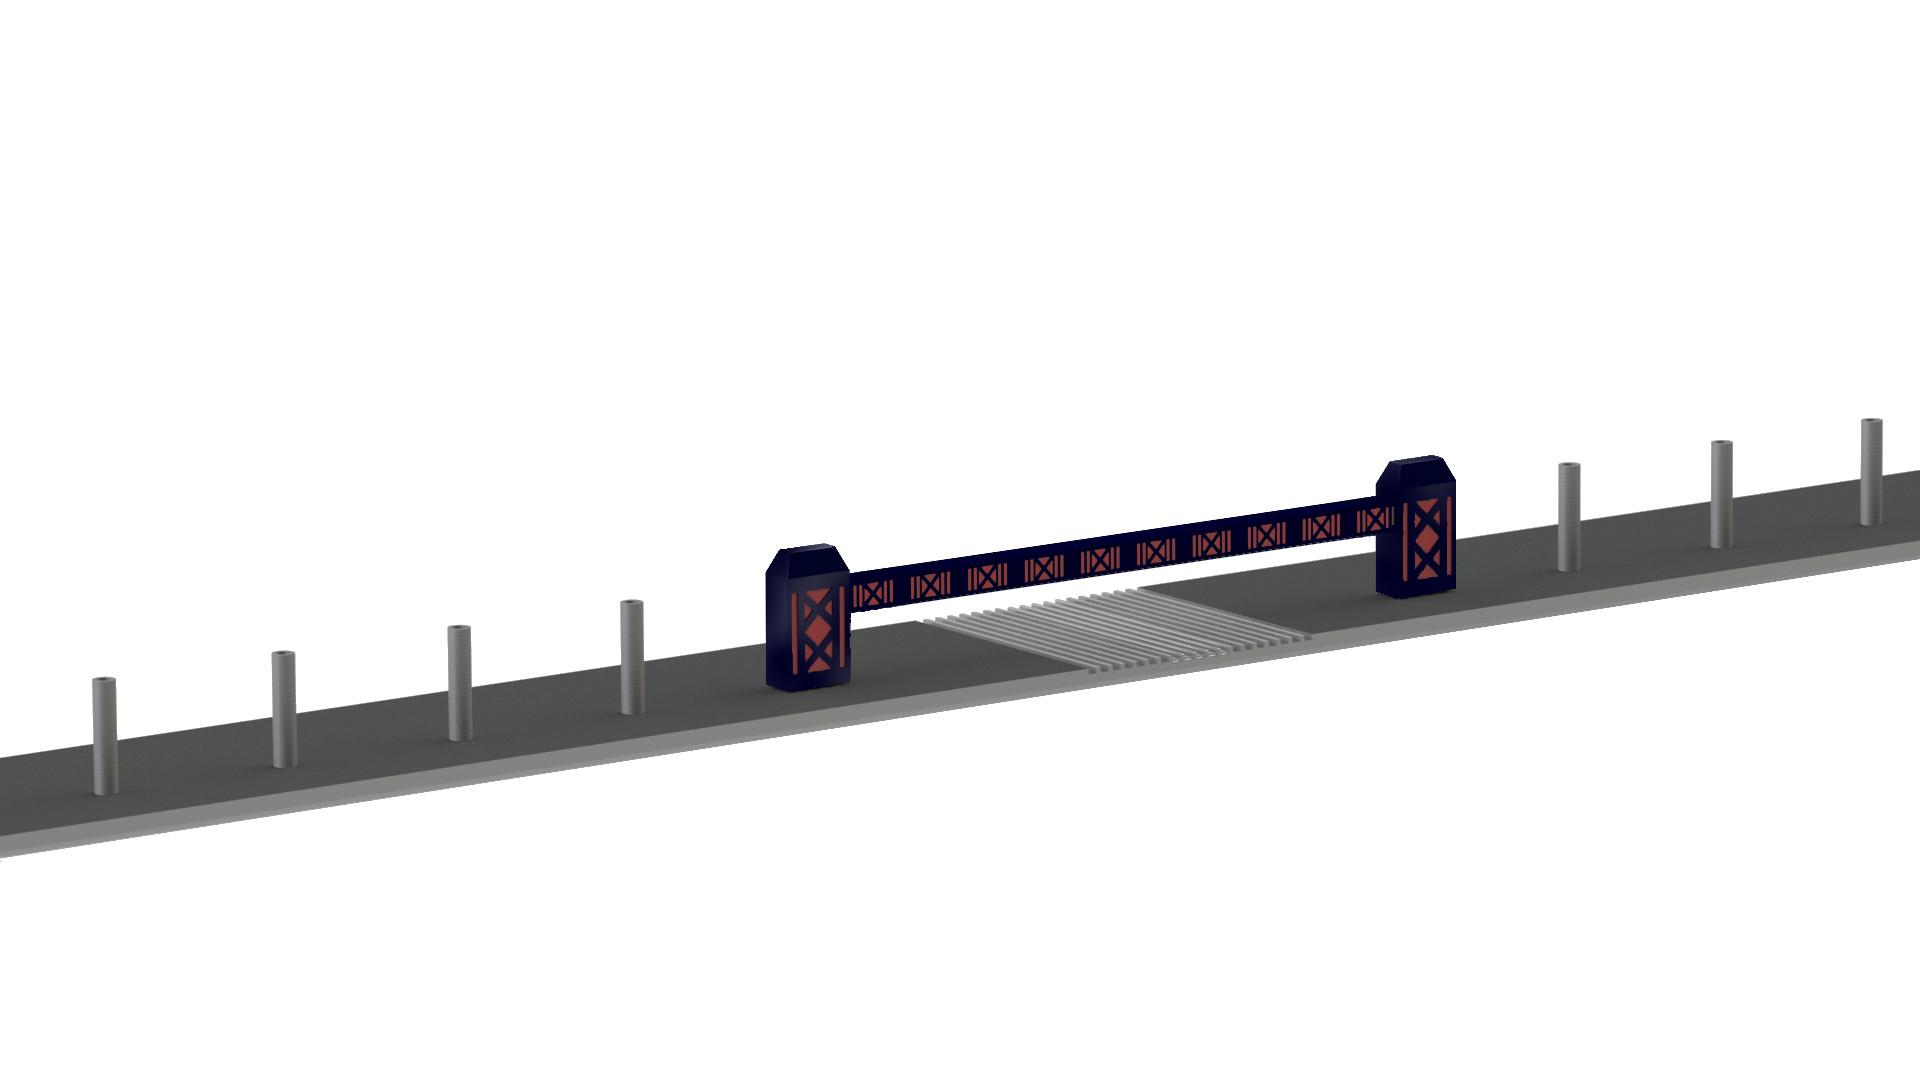 ATG launches 'next generation' bridge protection technology